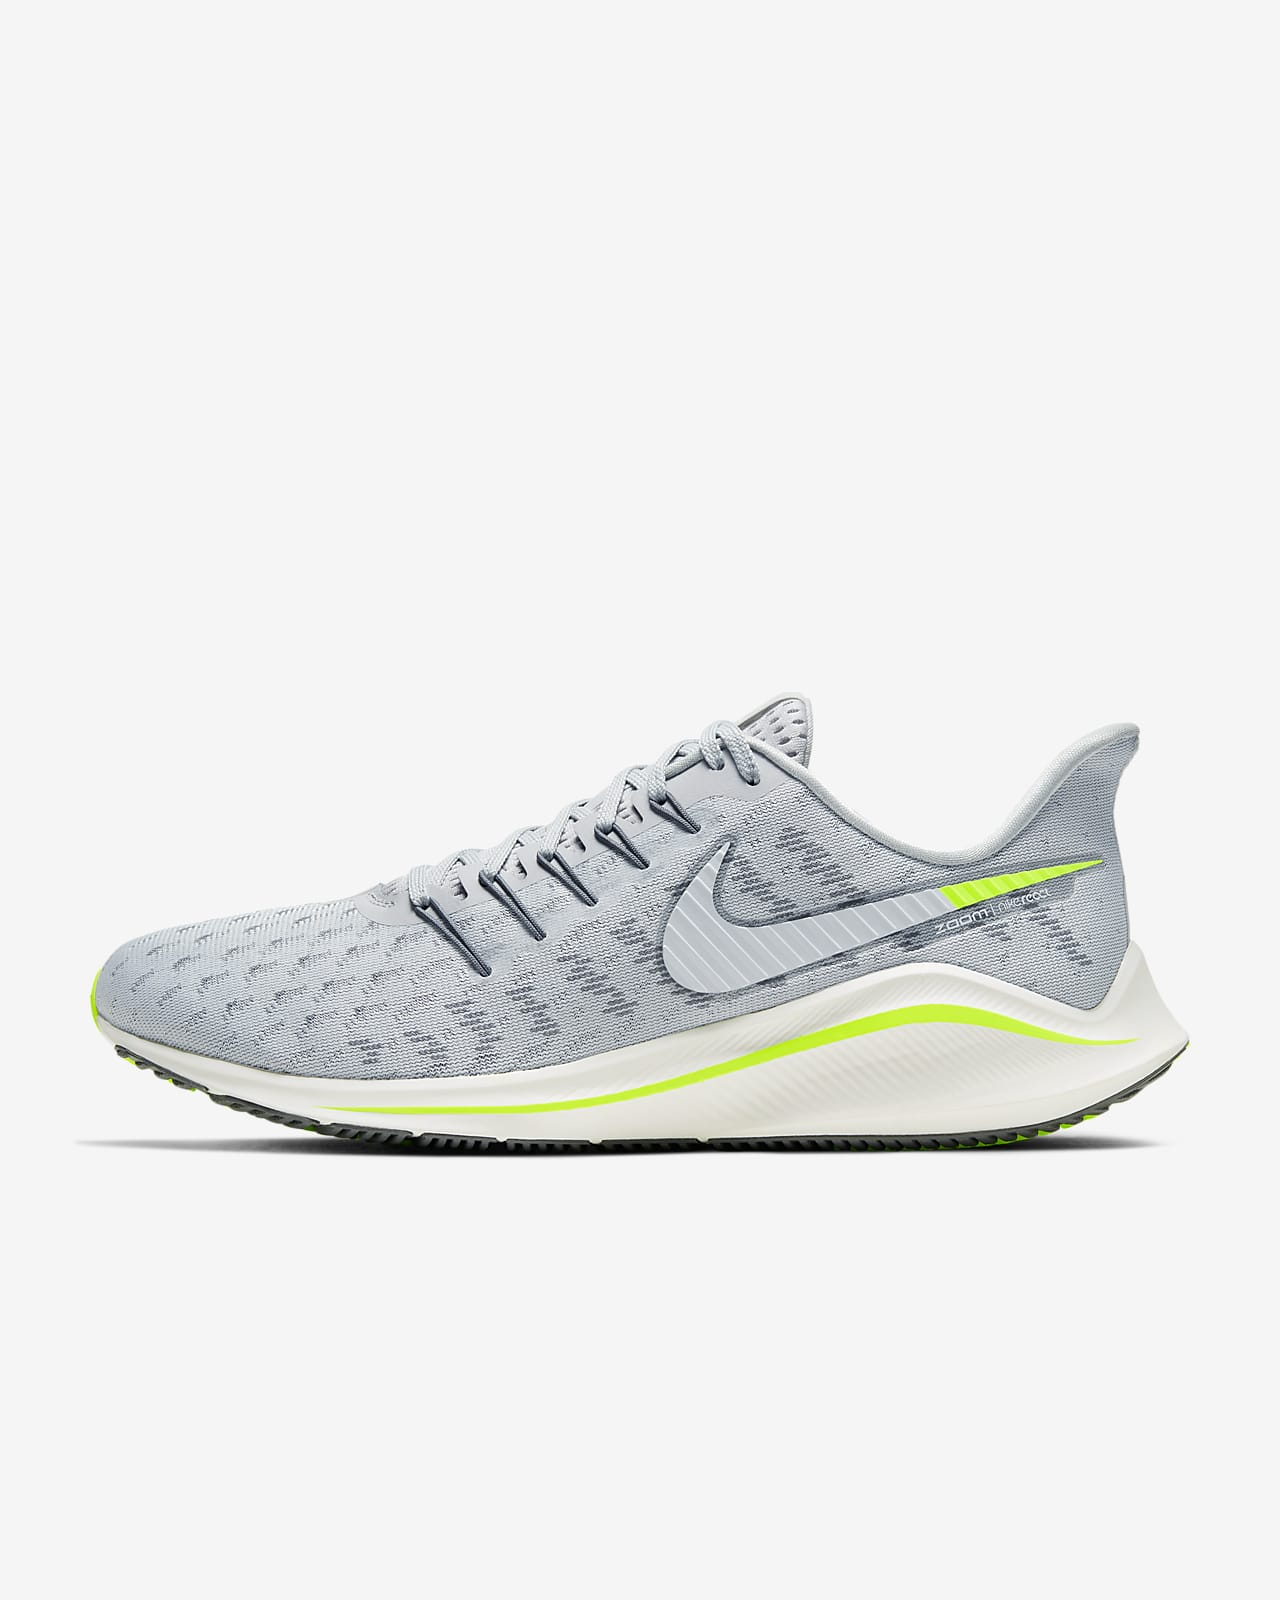 invierno Arancel templar  Nike Air Zoom Vomero 14 Men's Running Shoe. Nike MY